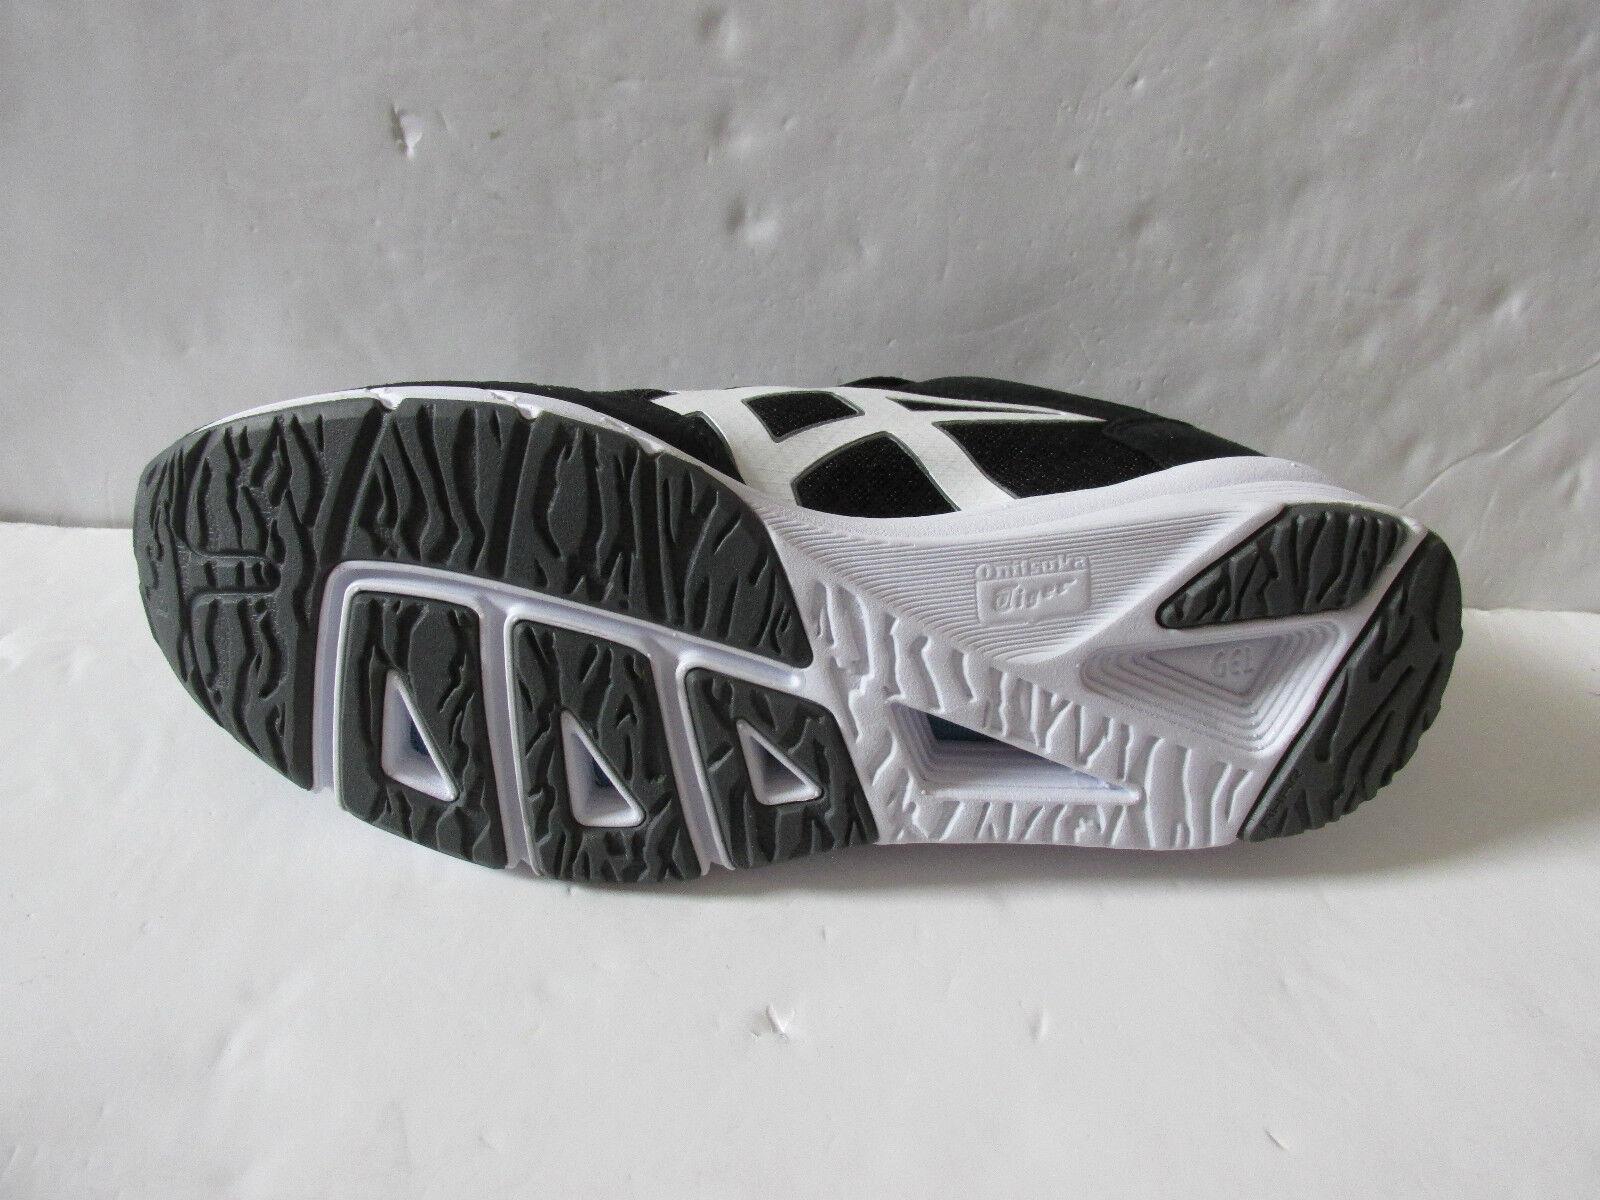 Onitskua tiger shaw runner schuhe mens trainers D405N 9001 Turnschuhe schuhe runner asics 8e6072